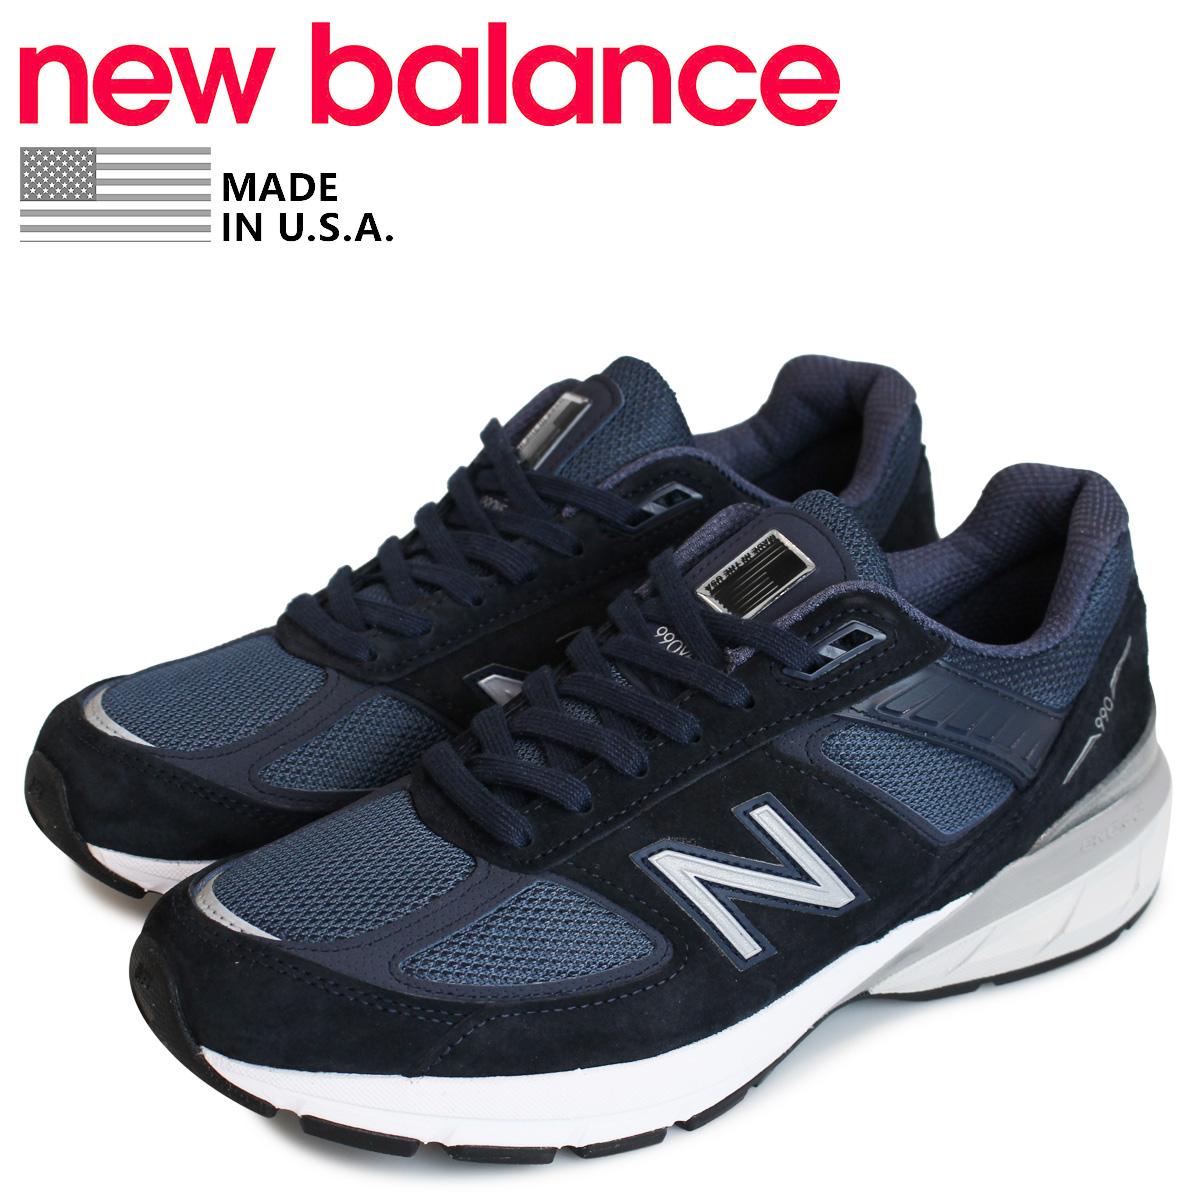 new balance ニューバランス 990 スニーカー メンズ Dワイズ MADE IN USA ネイビー M990NV5